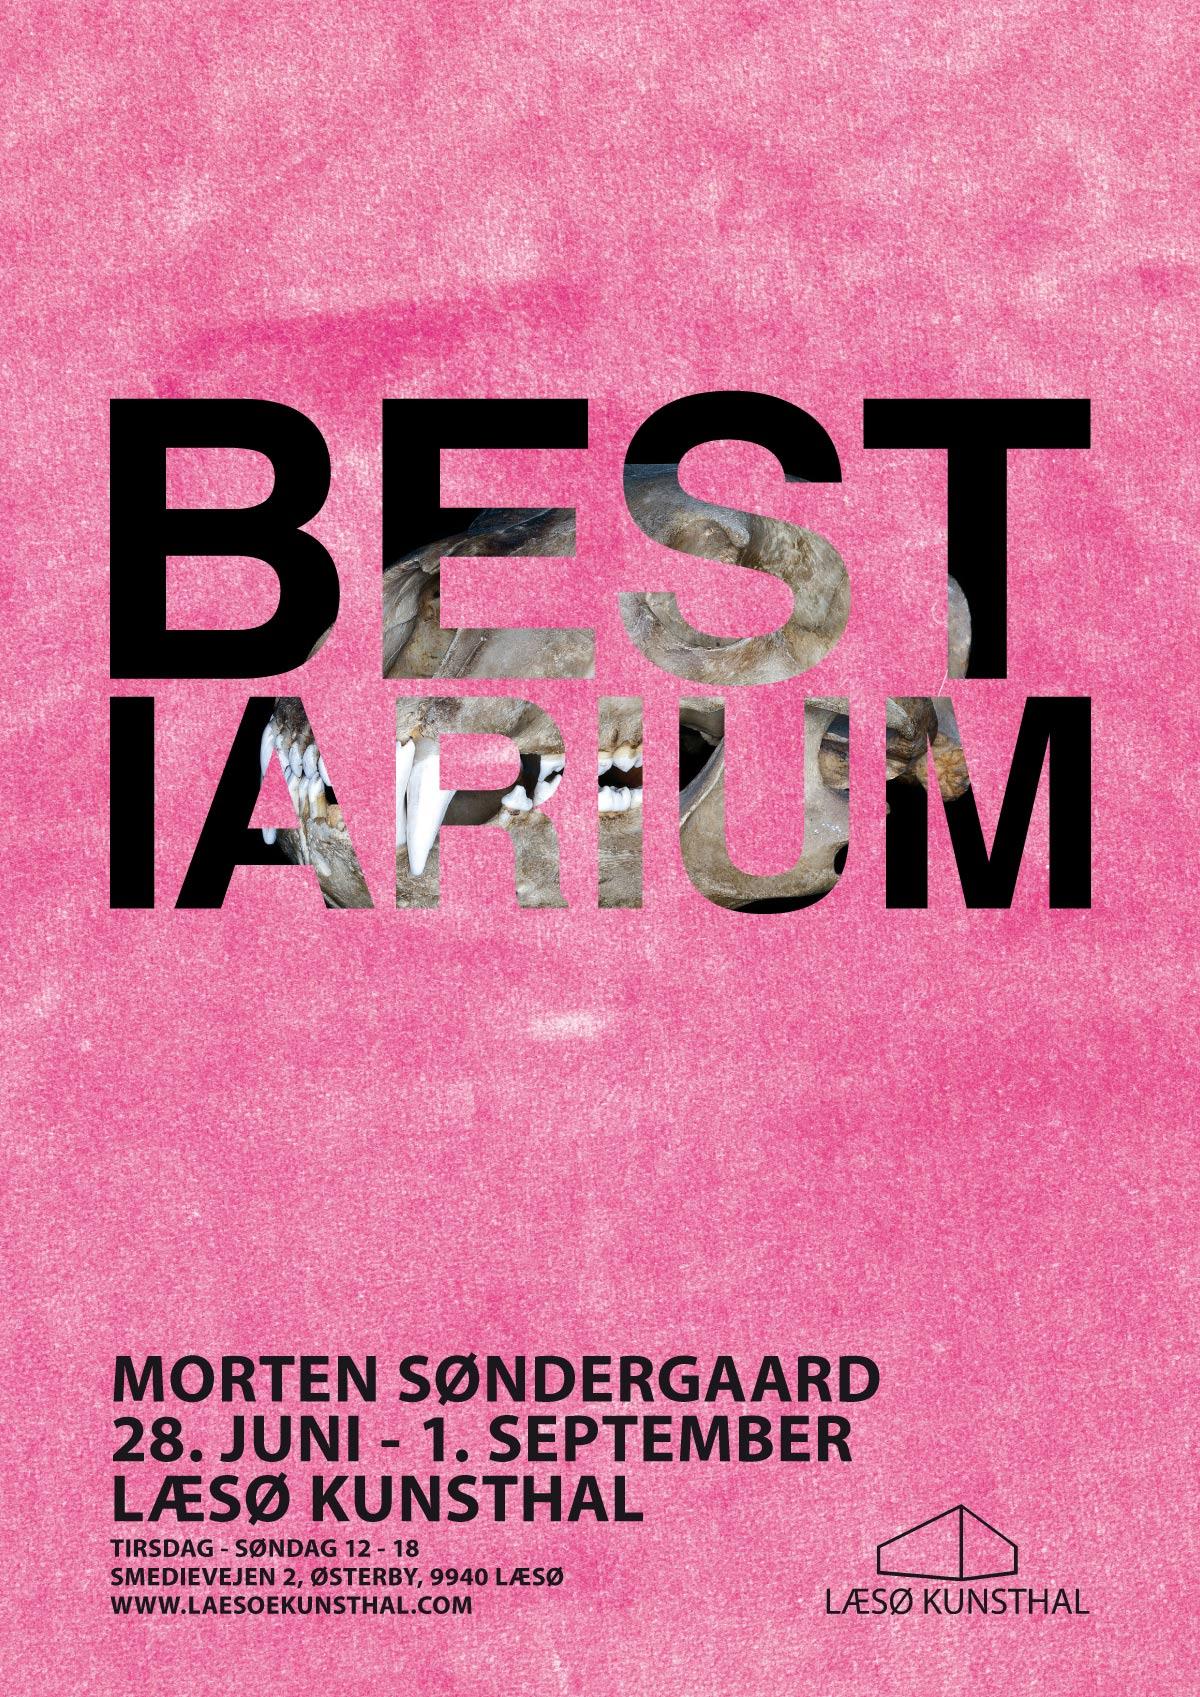 Læsø Kunsthal 2014: Bestiarium af Morten Søndergaard